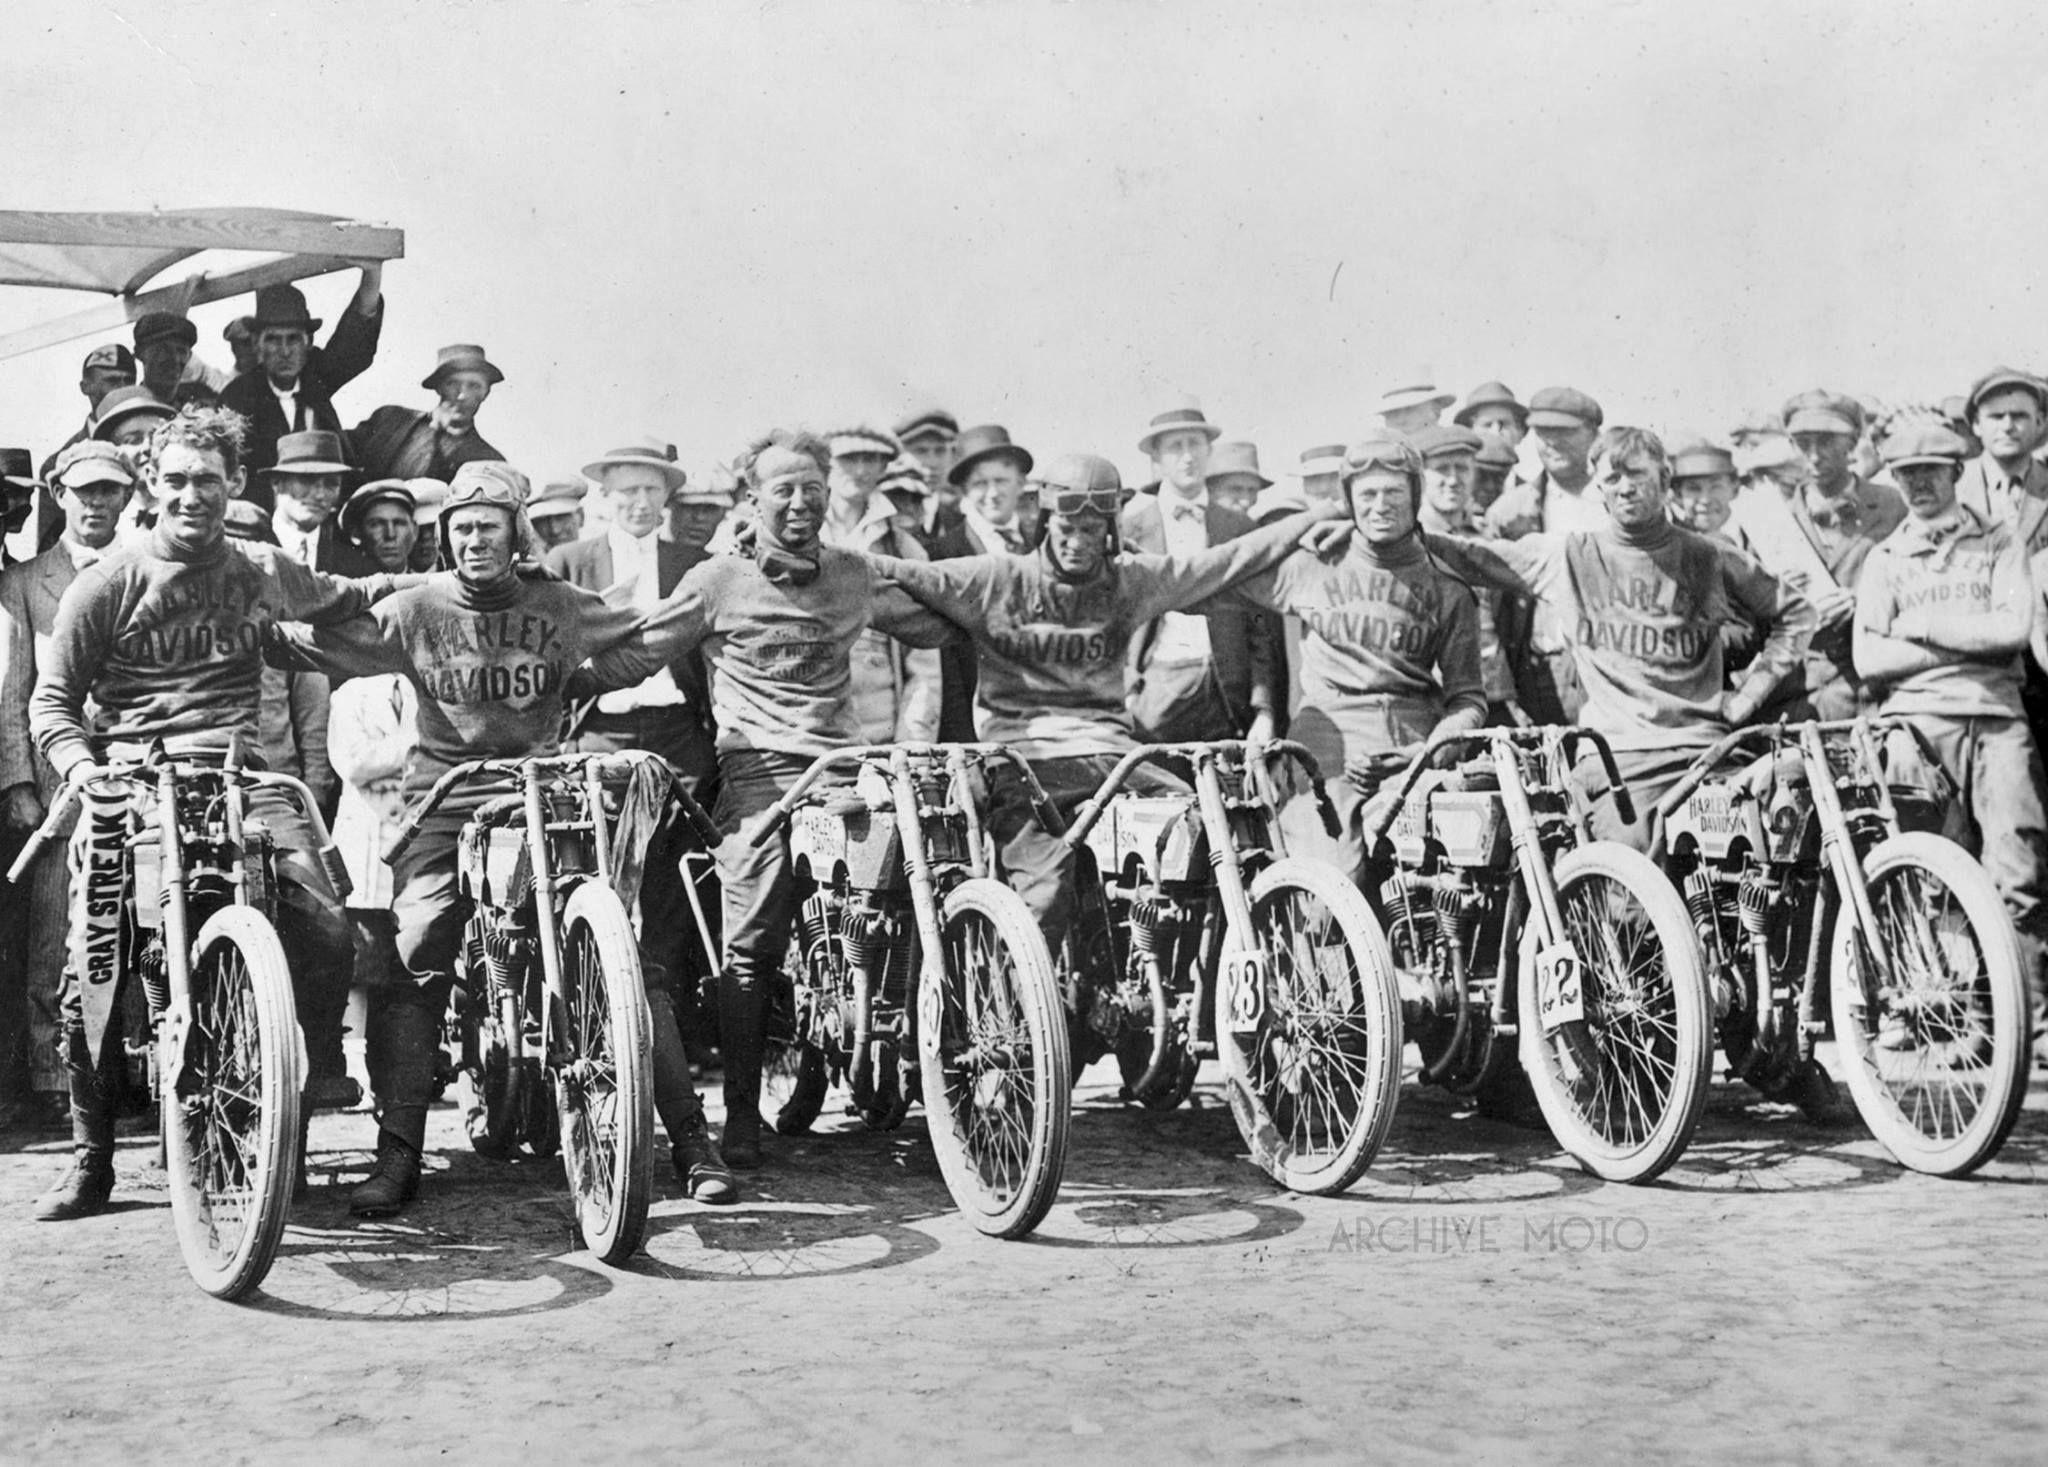 1915 H D Racing Team At The Dodge City Race Tom Parkhurst